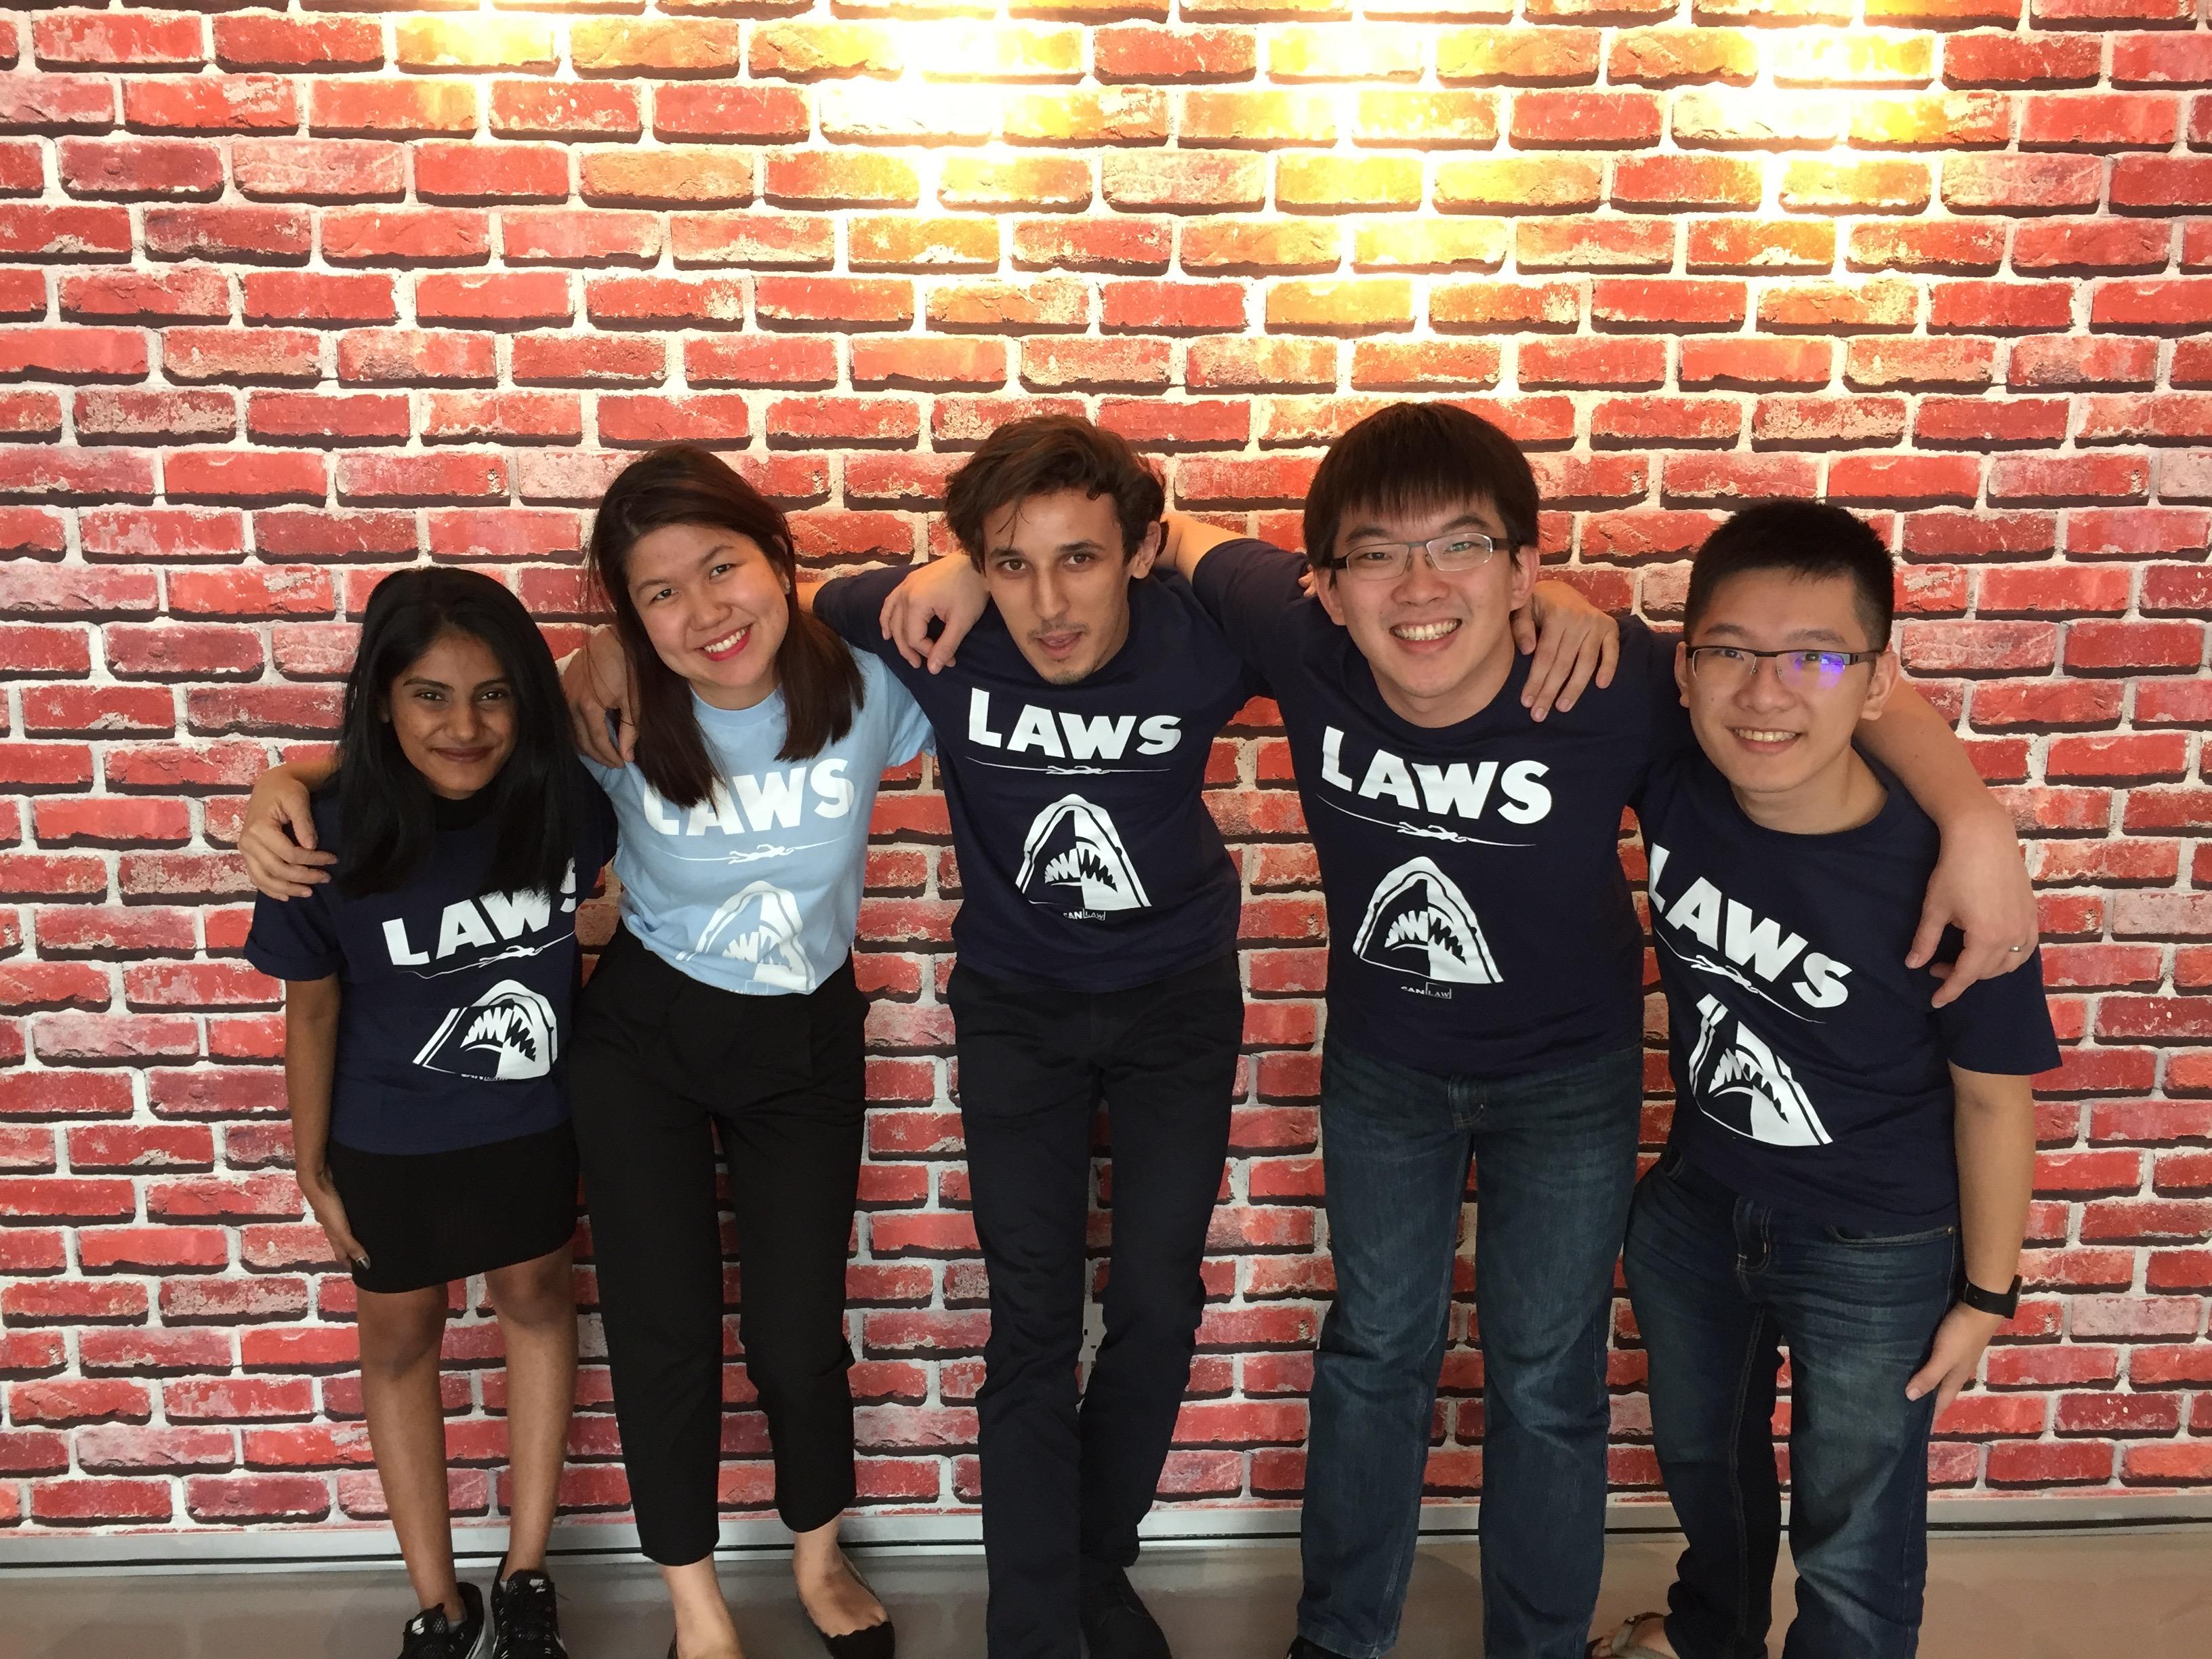 Laws team